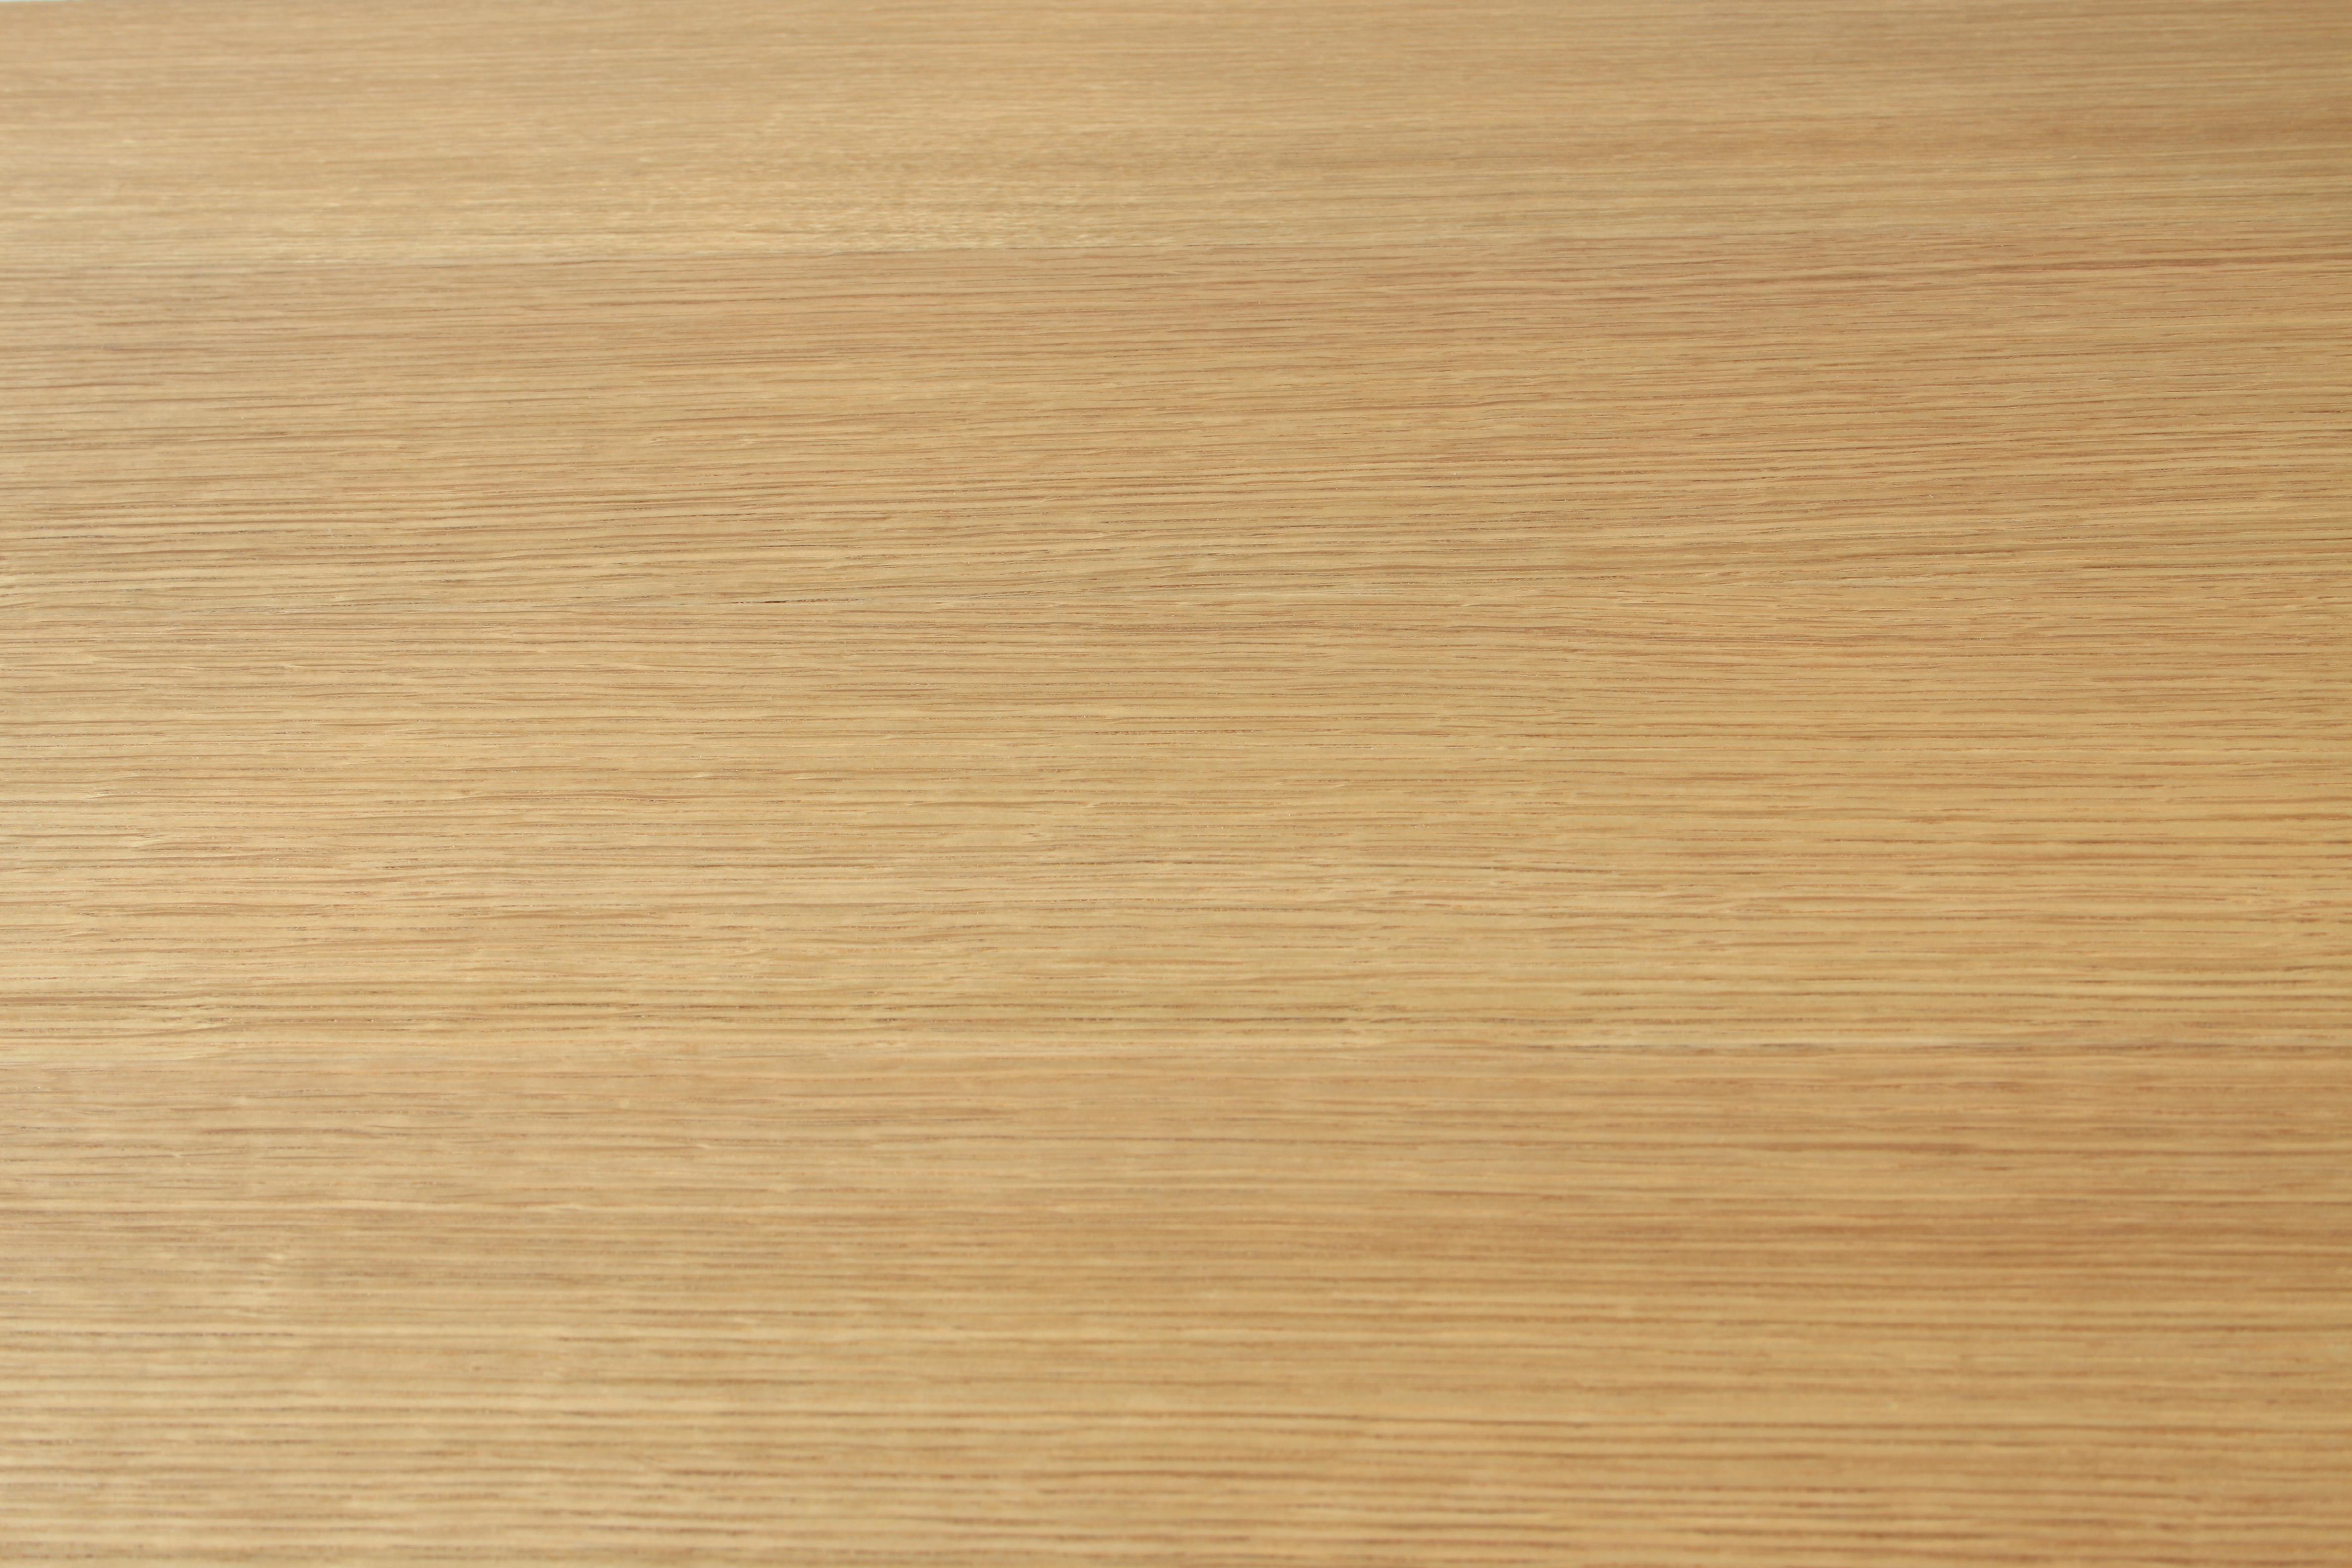 Rift White Oak | Charles Peterson Signature Wood Flooring